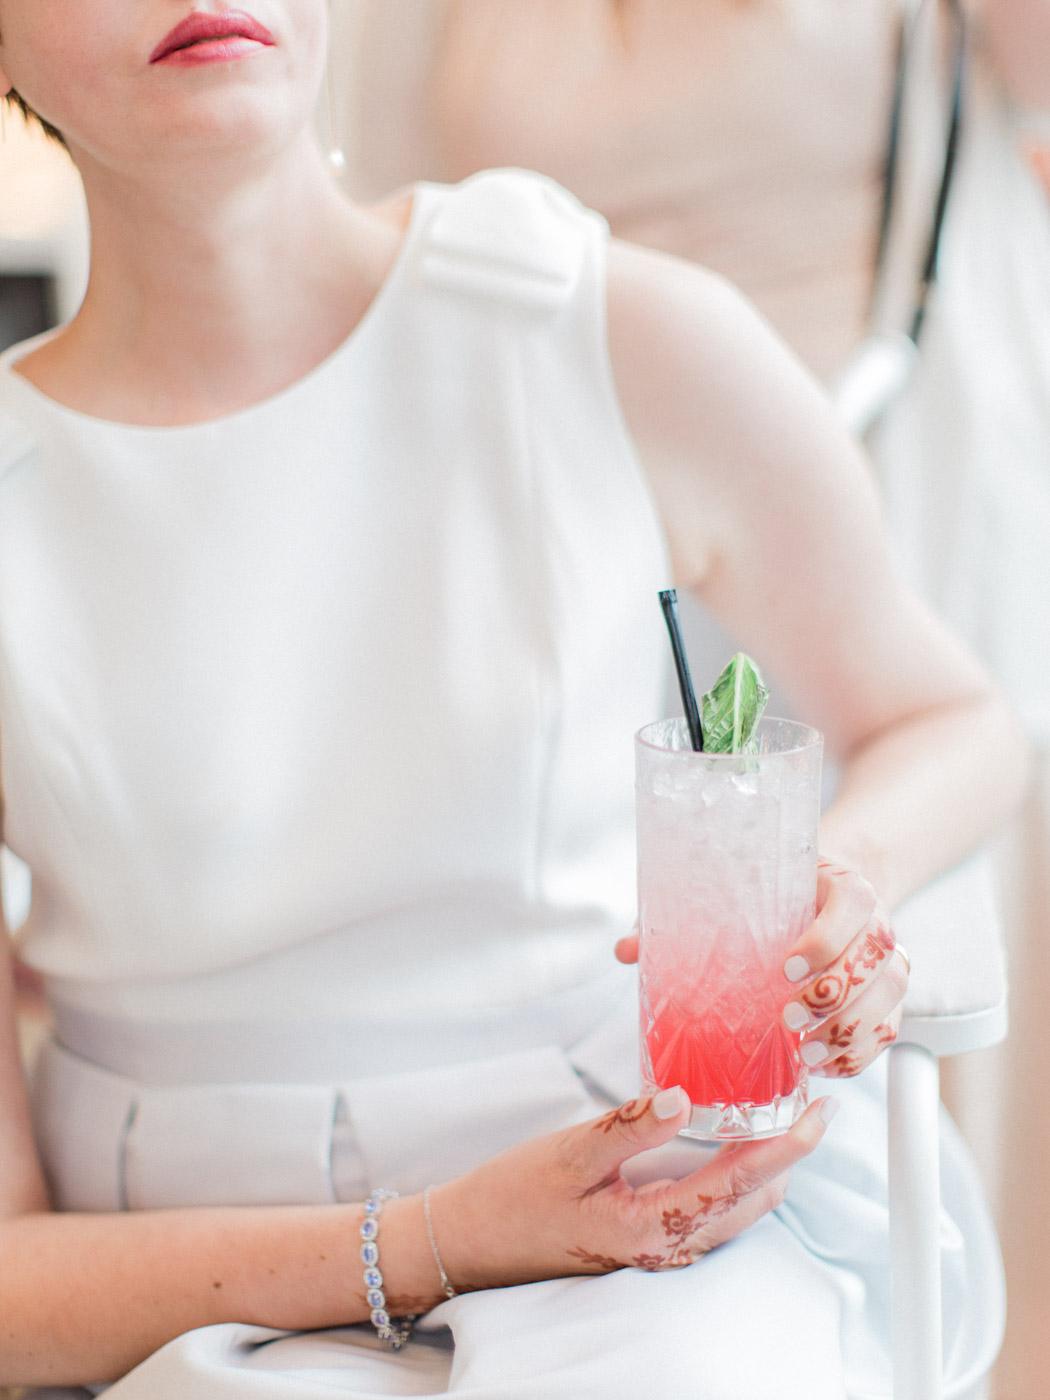 Toronto-wedding-photographer-intimate-restaurant-elopement-chase-oyster-downtown45.jpg